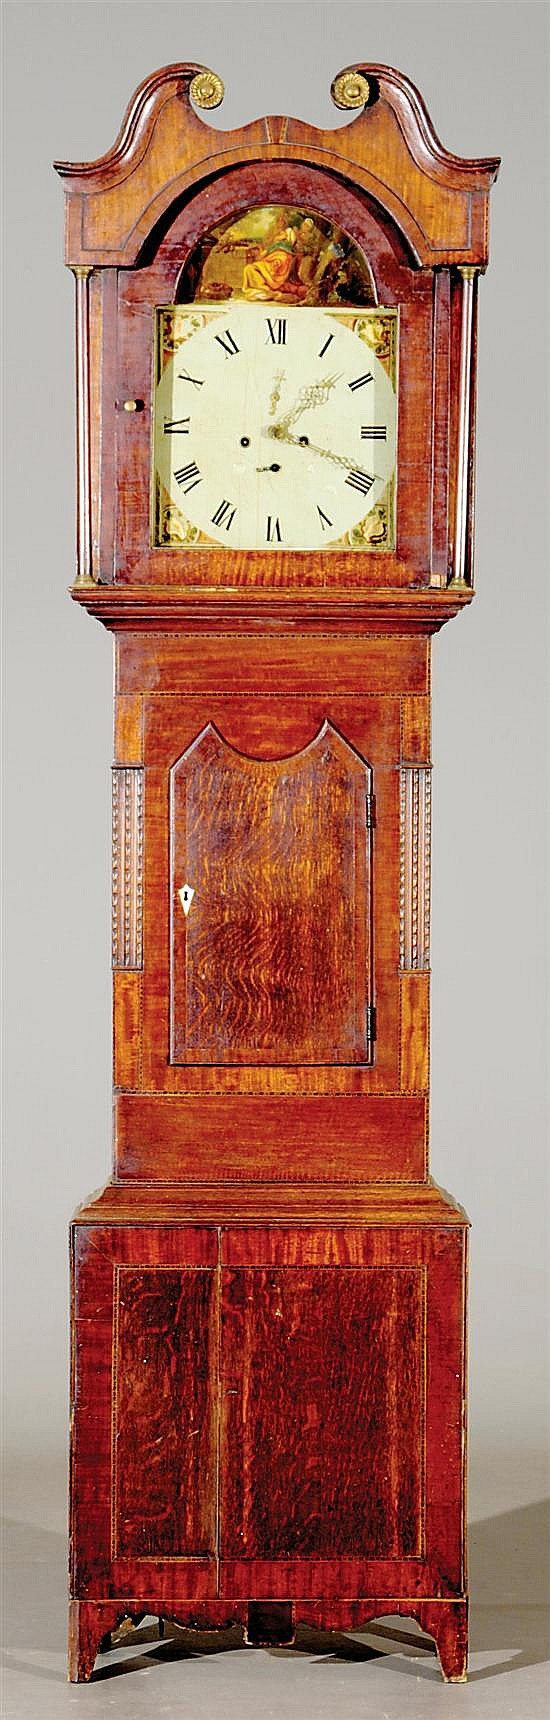 Scottish inlaid oak tall case clock